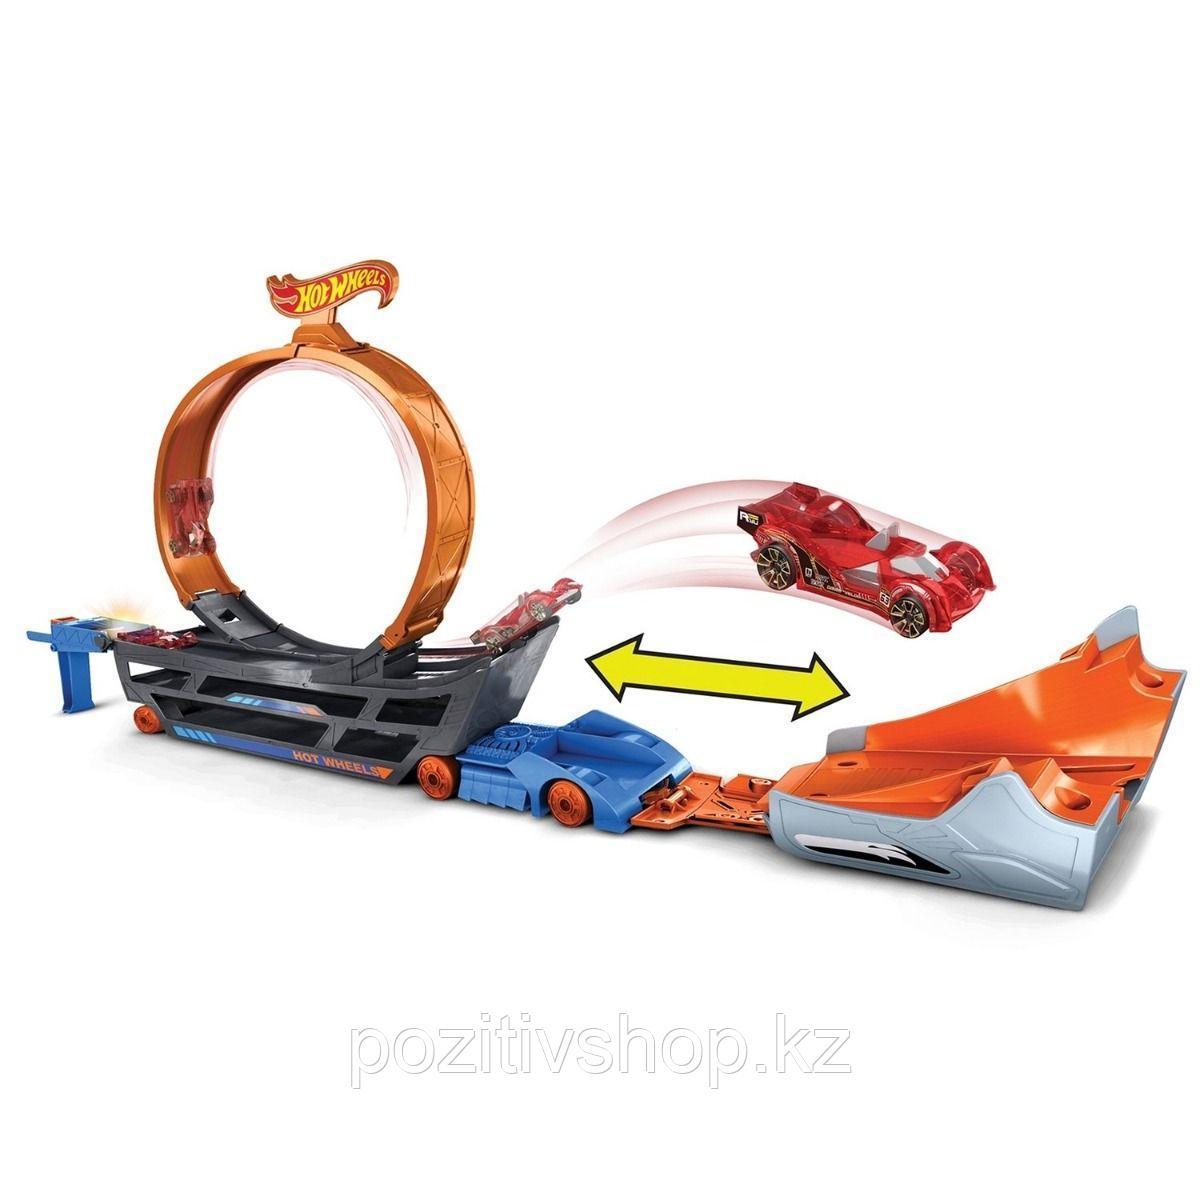 Автовоз-трансформер Hot Wheels Basic - фото 2